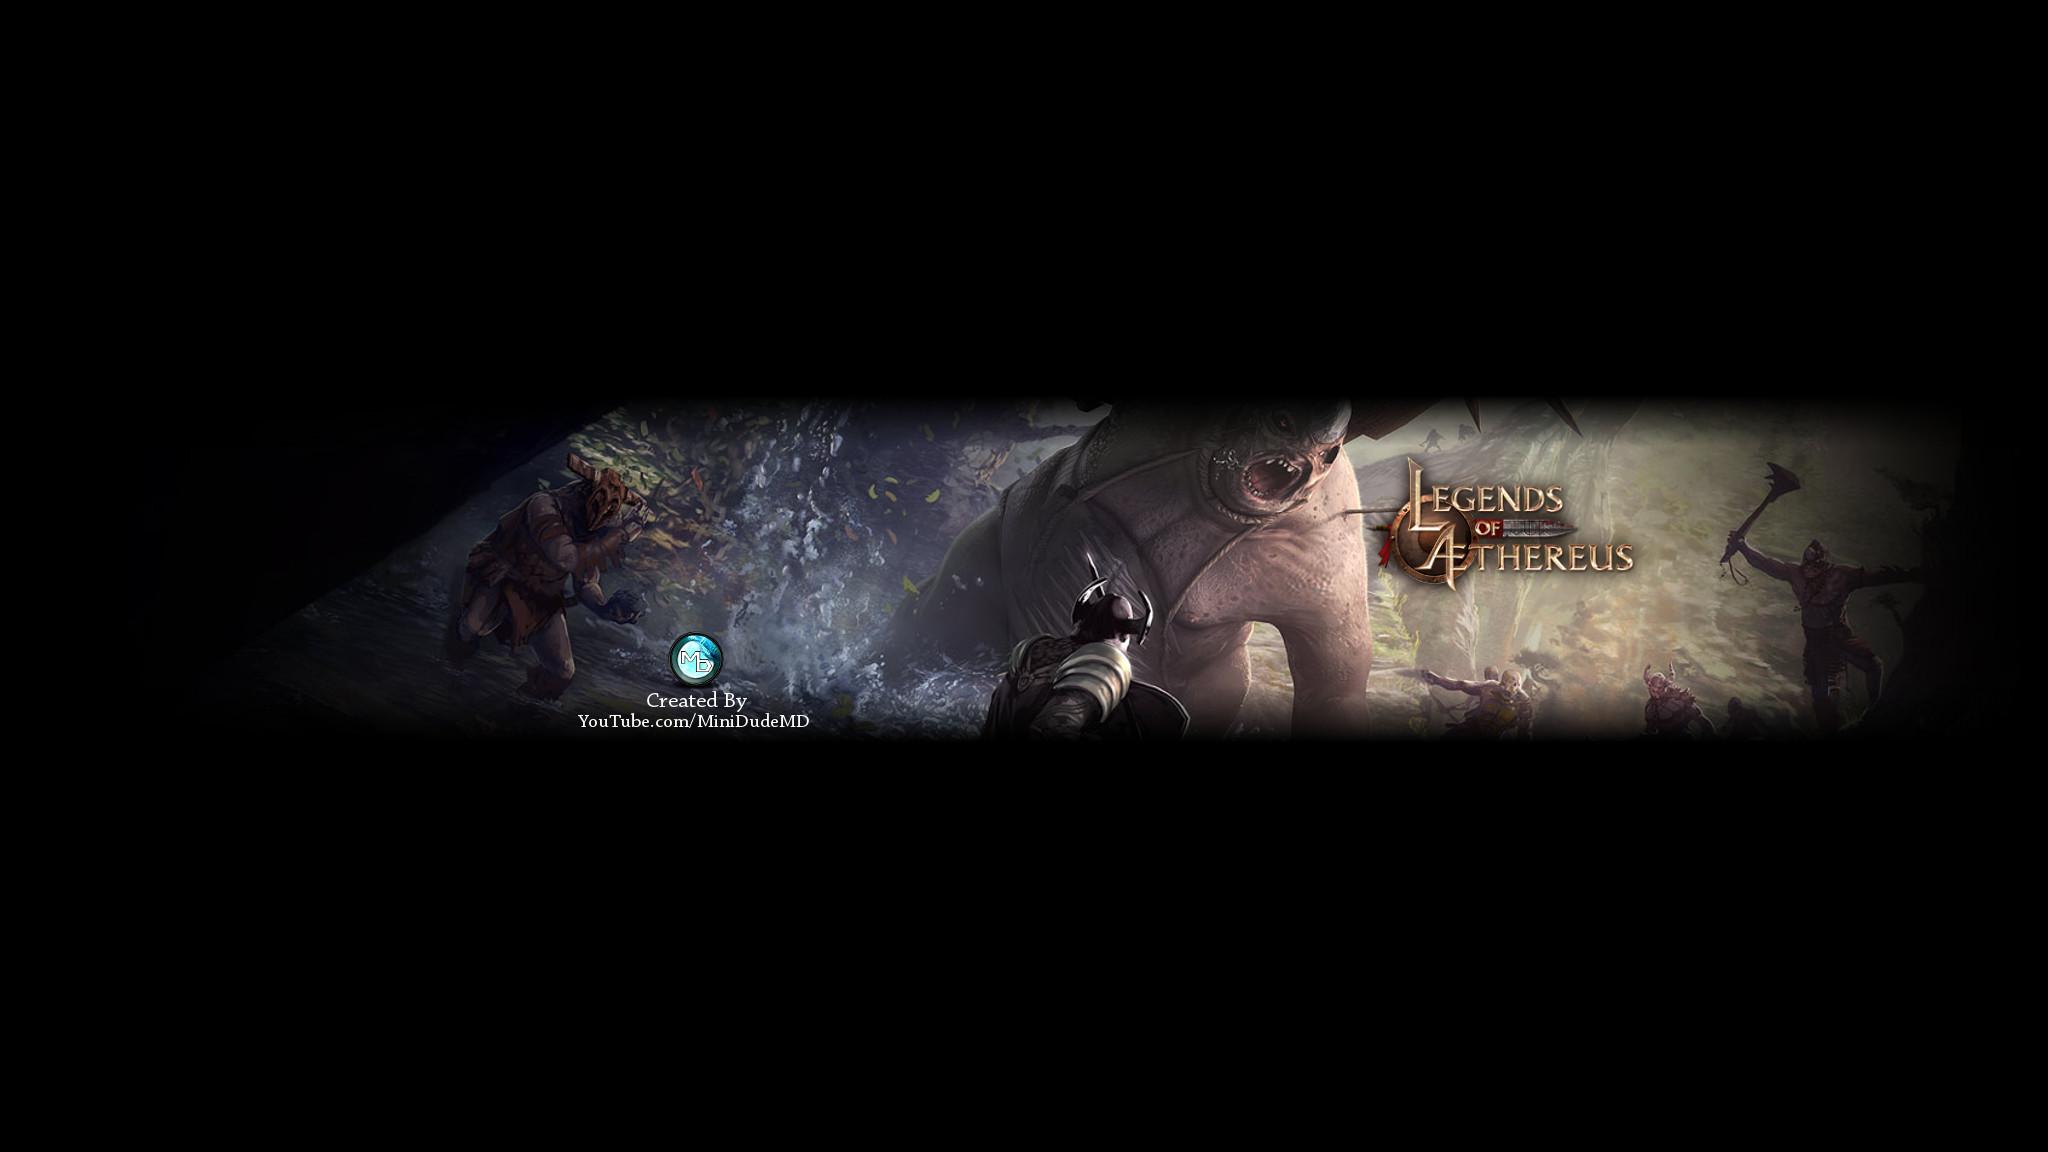 … Legends of Aethereus – YouTube Banner V1 by MiniDudeMD